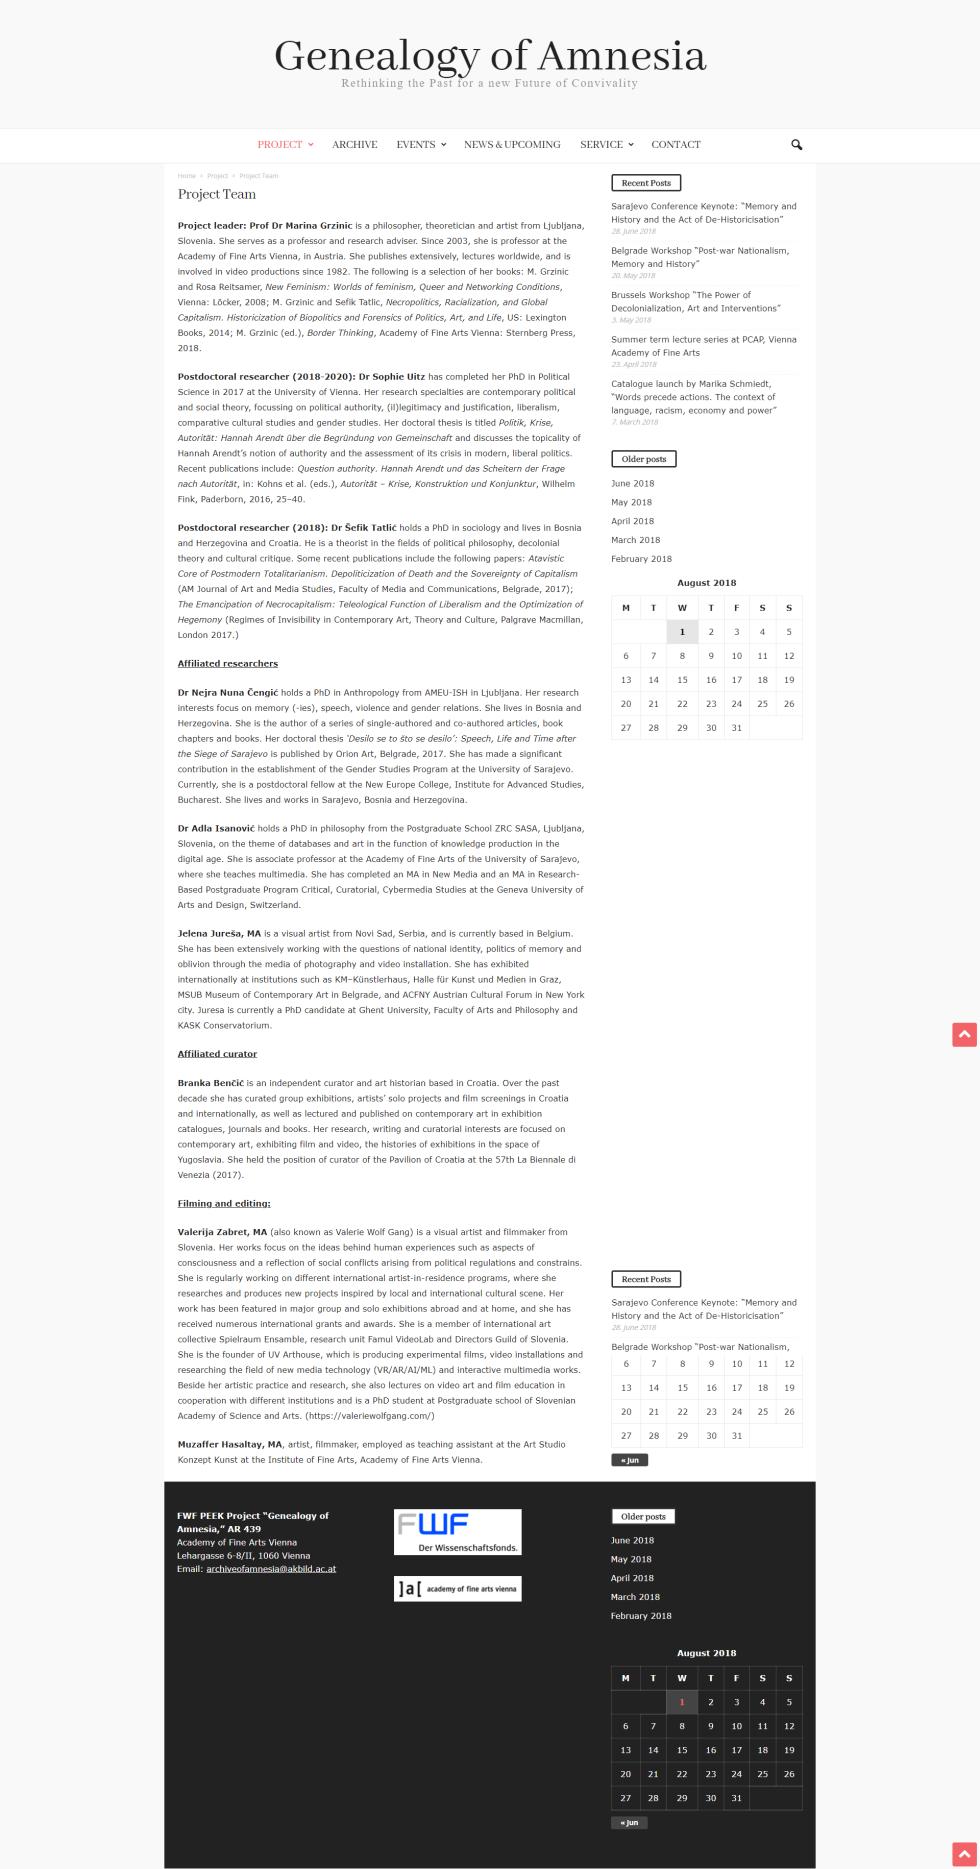 screencapture-archiveofamnesia-akbild-ac-at-2018-08-01-18_56_19.png